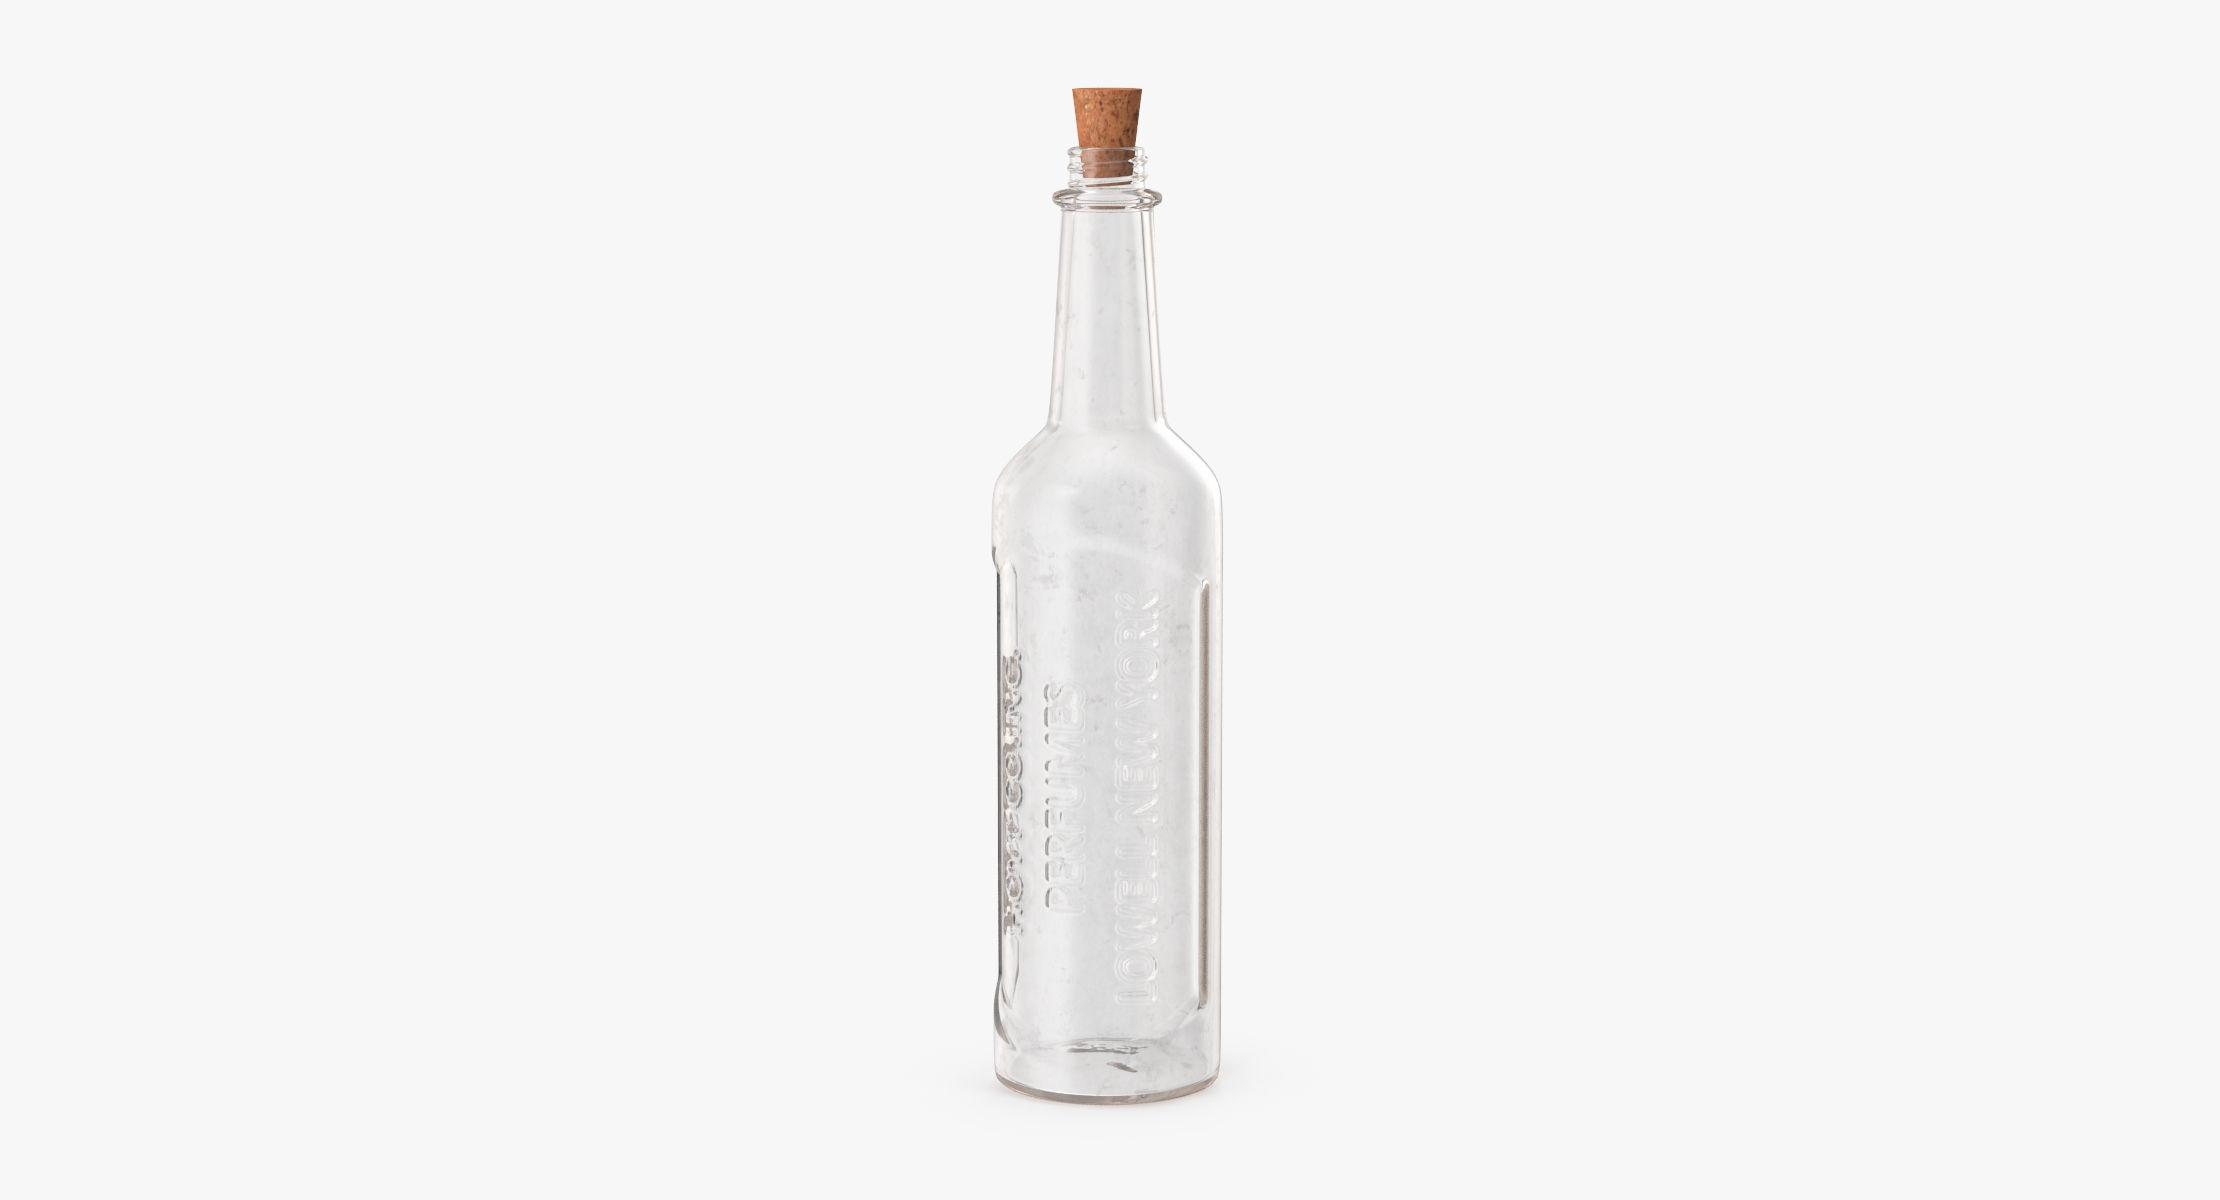 Old Glass Bottle 05 - reel 1